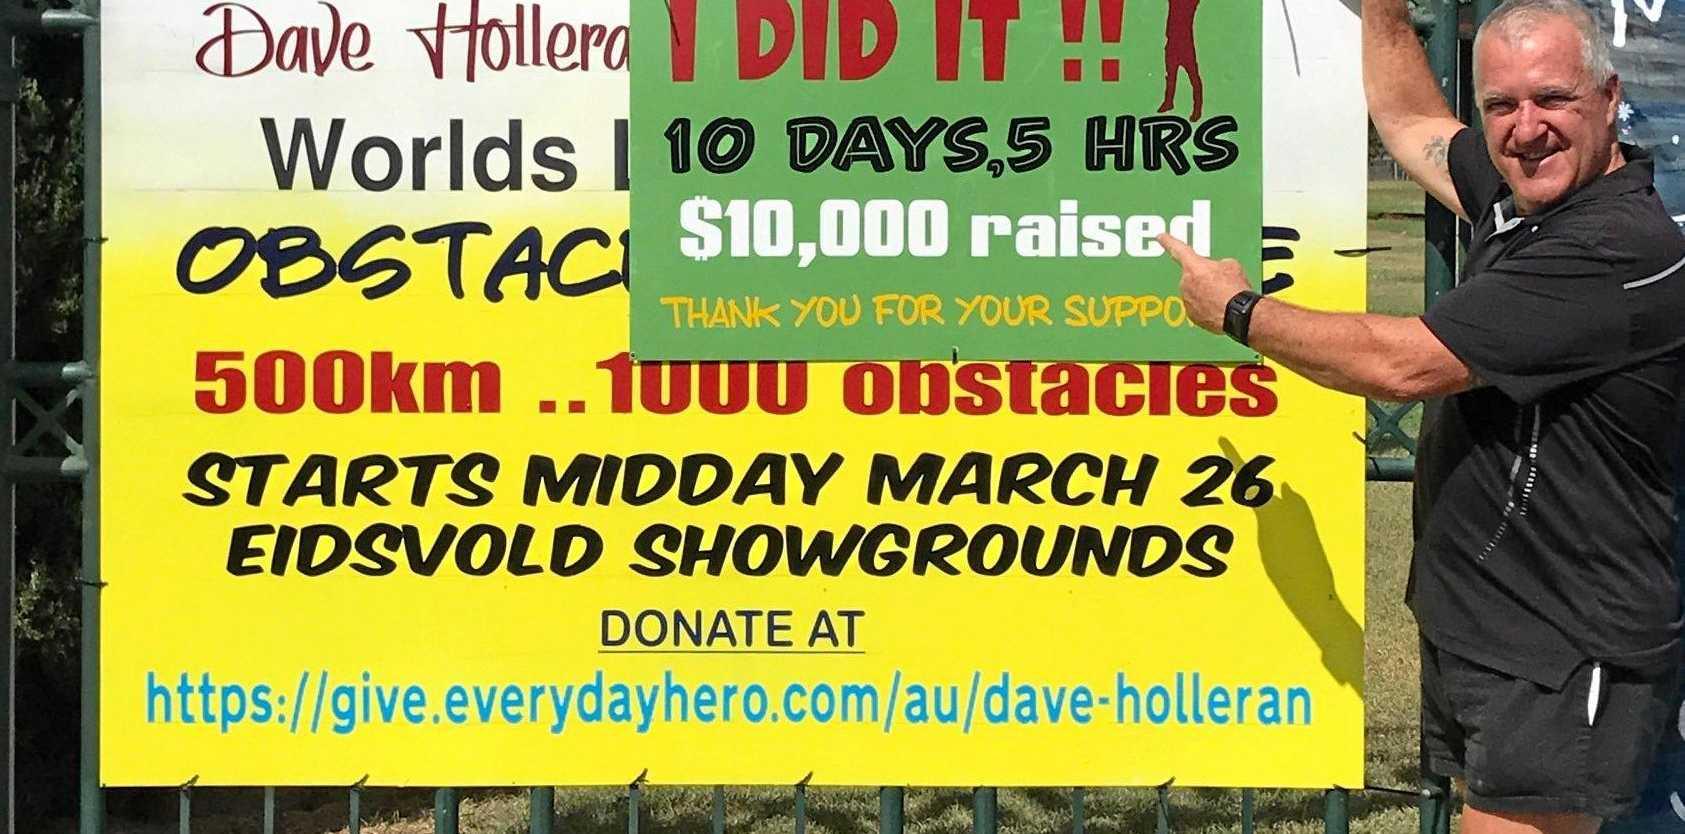 ACCOMPLISHED: David Holleran has raised more than $10,000 for the LifeFlight organisation.